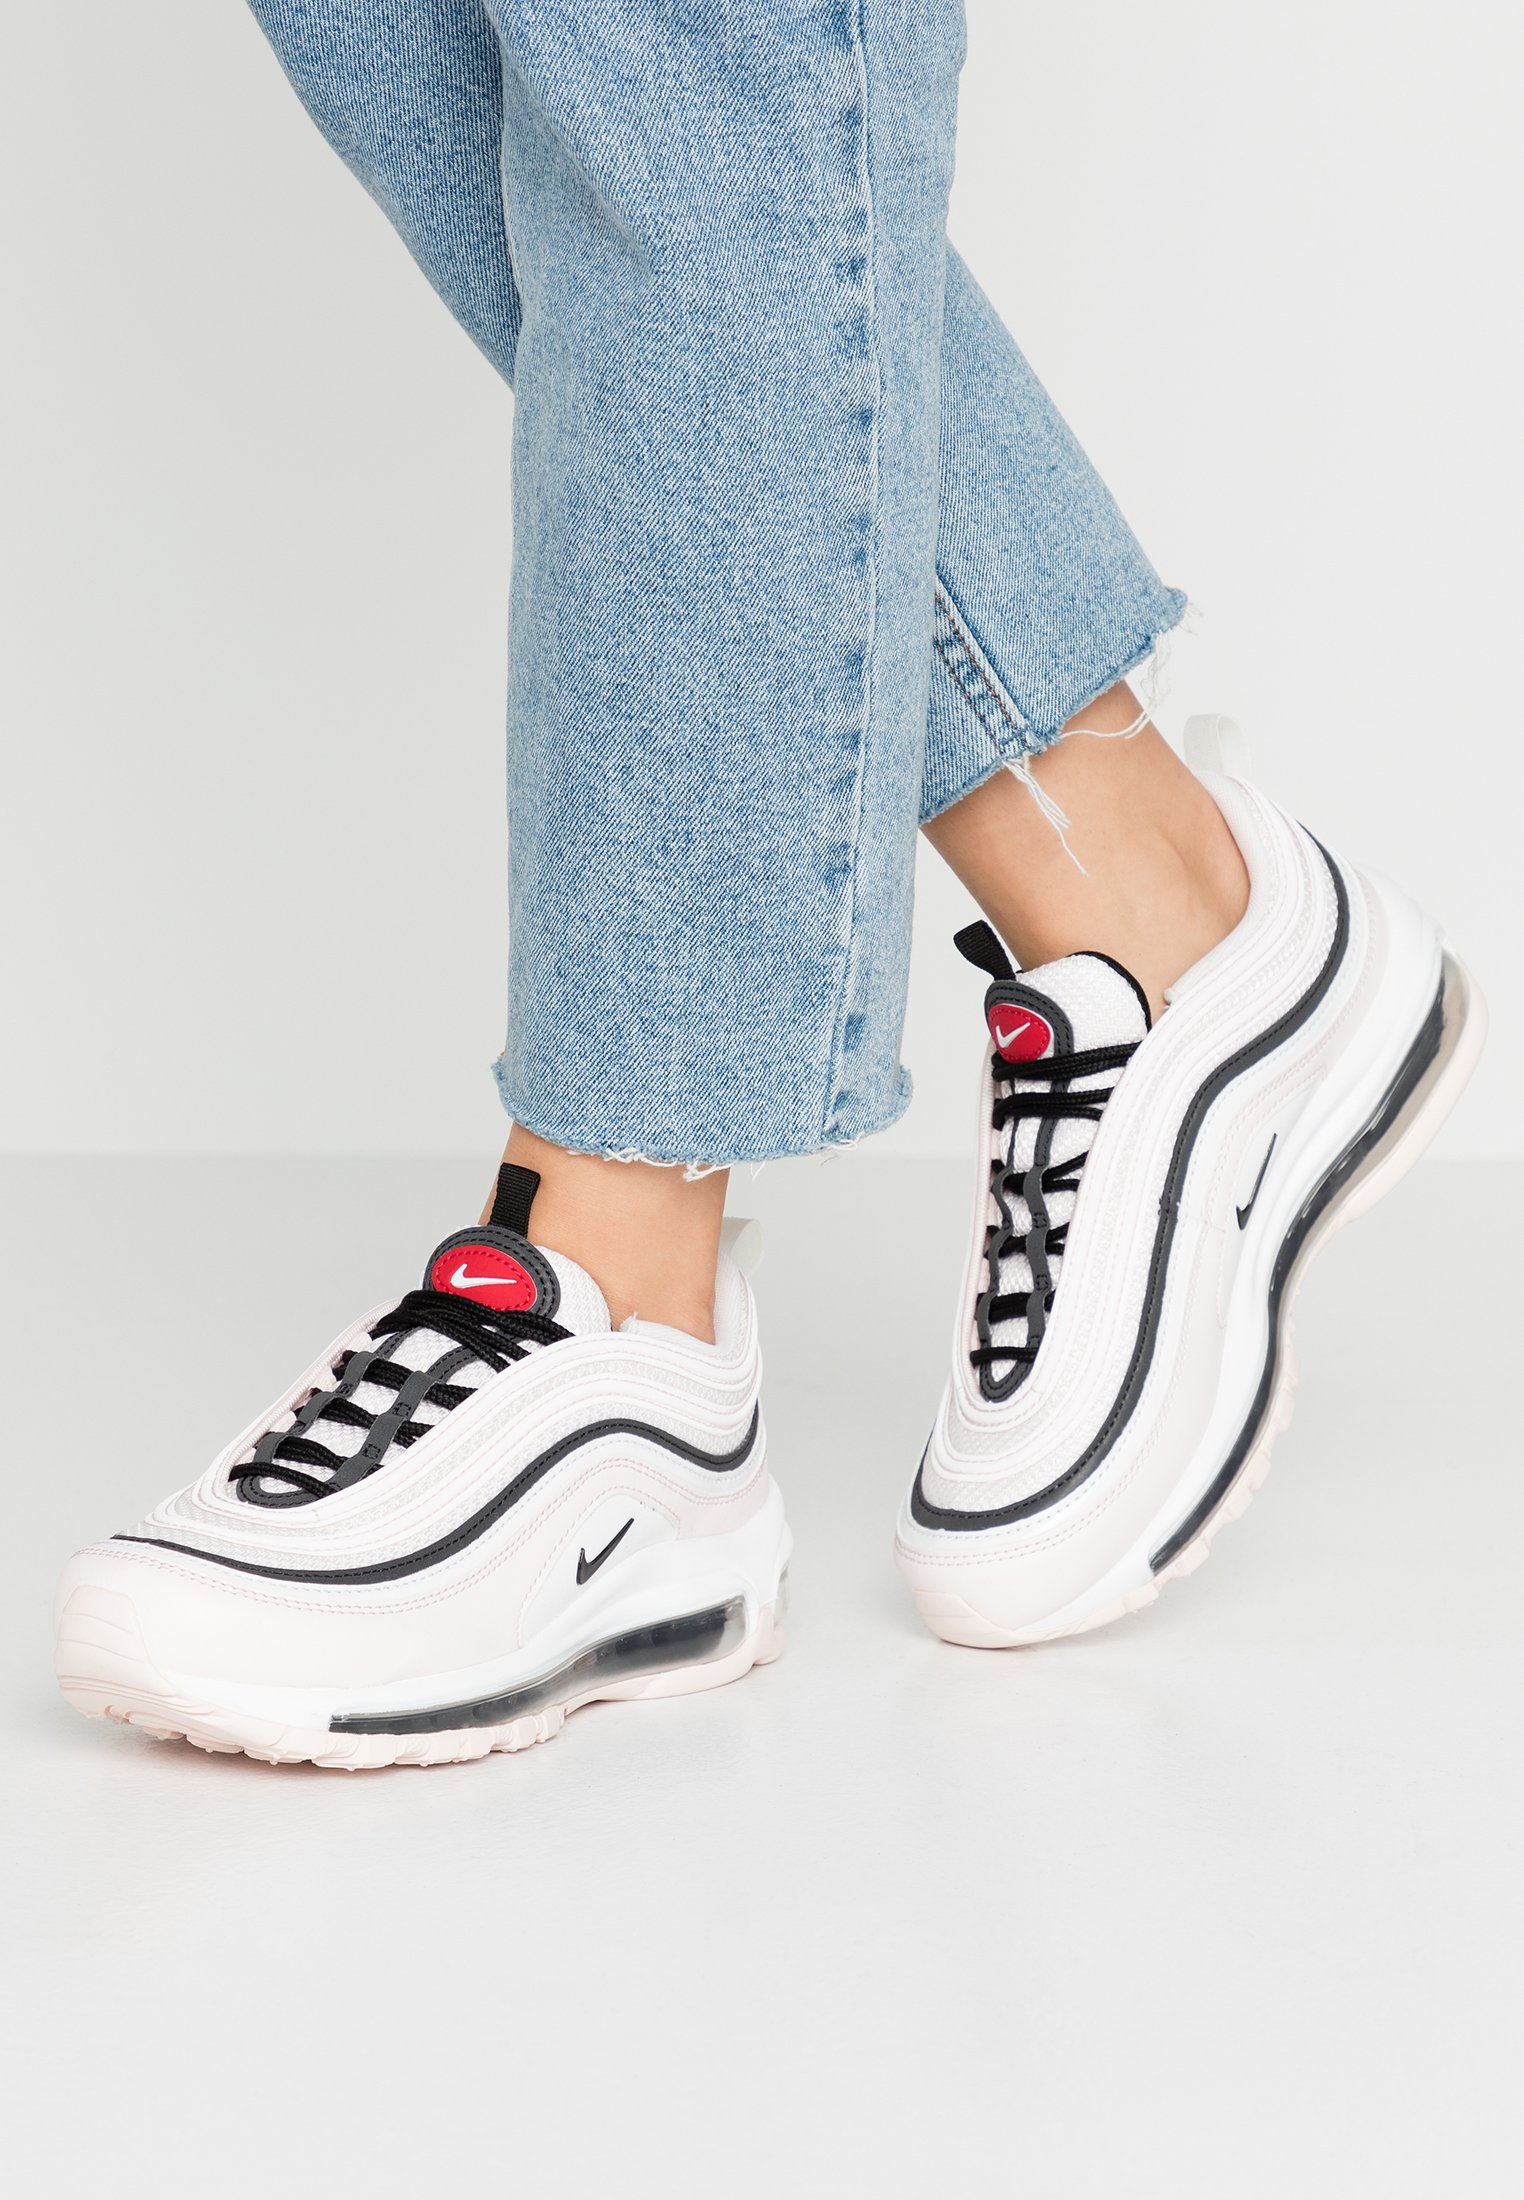 AIR MAX 97 Sneakers basse light soft pinkblacksummit whitegym redwhite